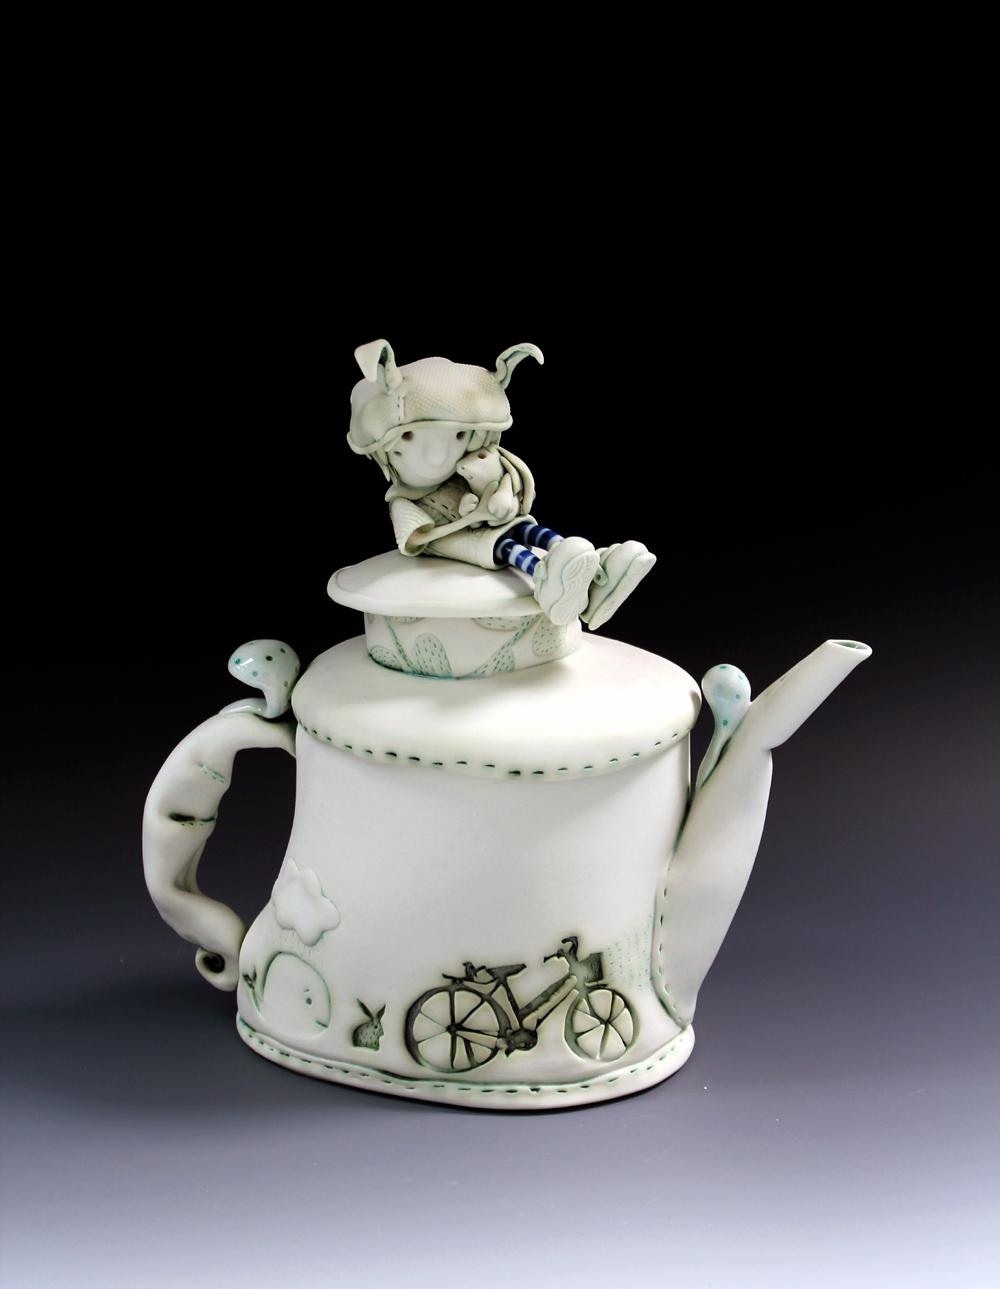 'Heidi and Bilby' Teapot W25cm x H24cm x D12cm